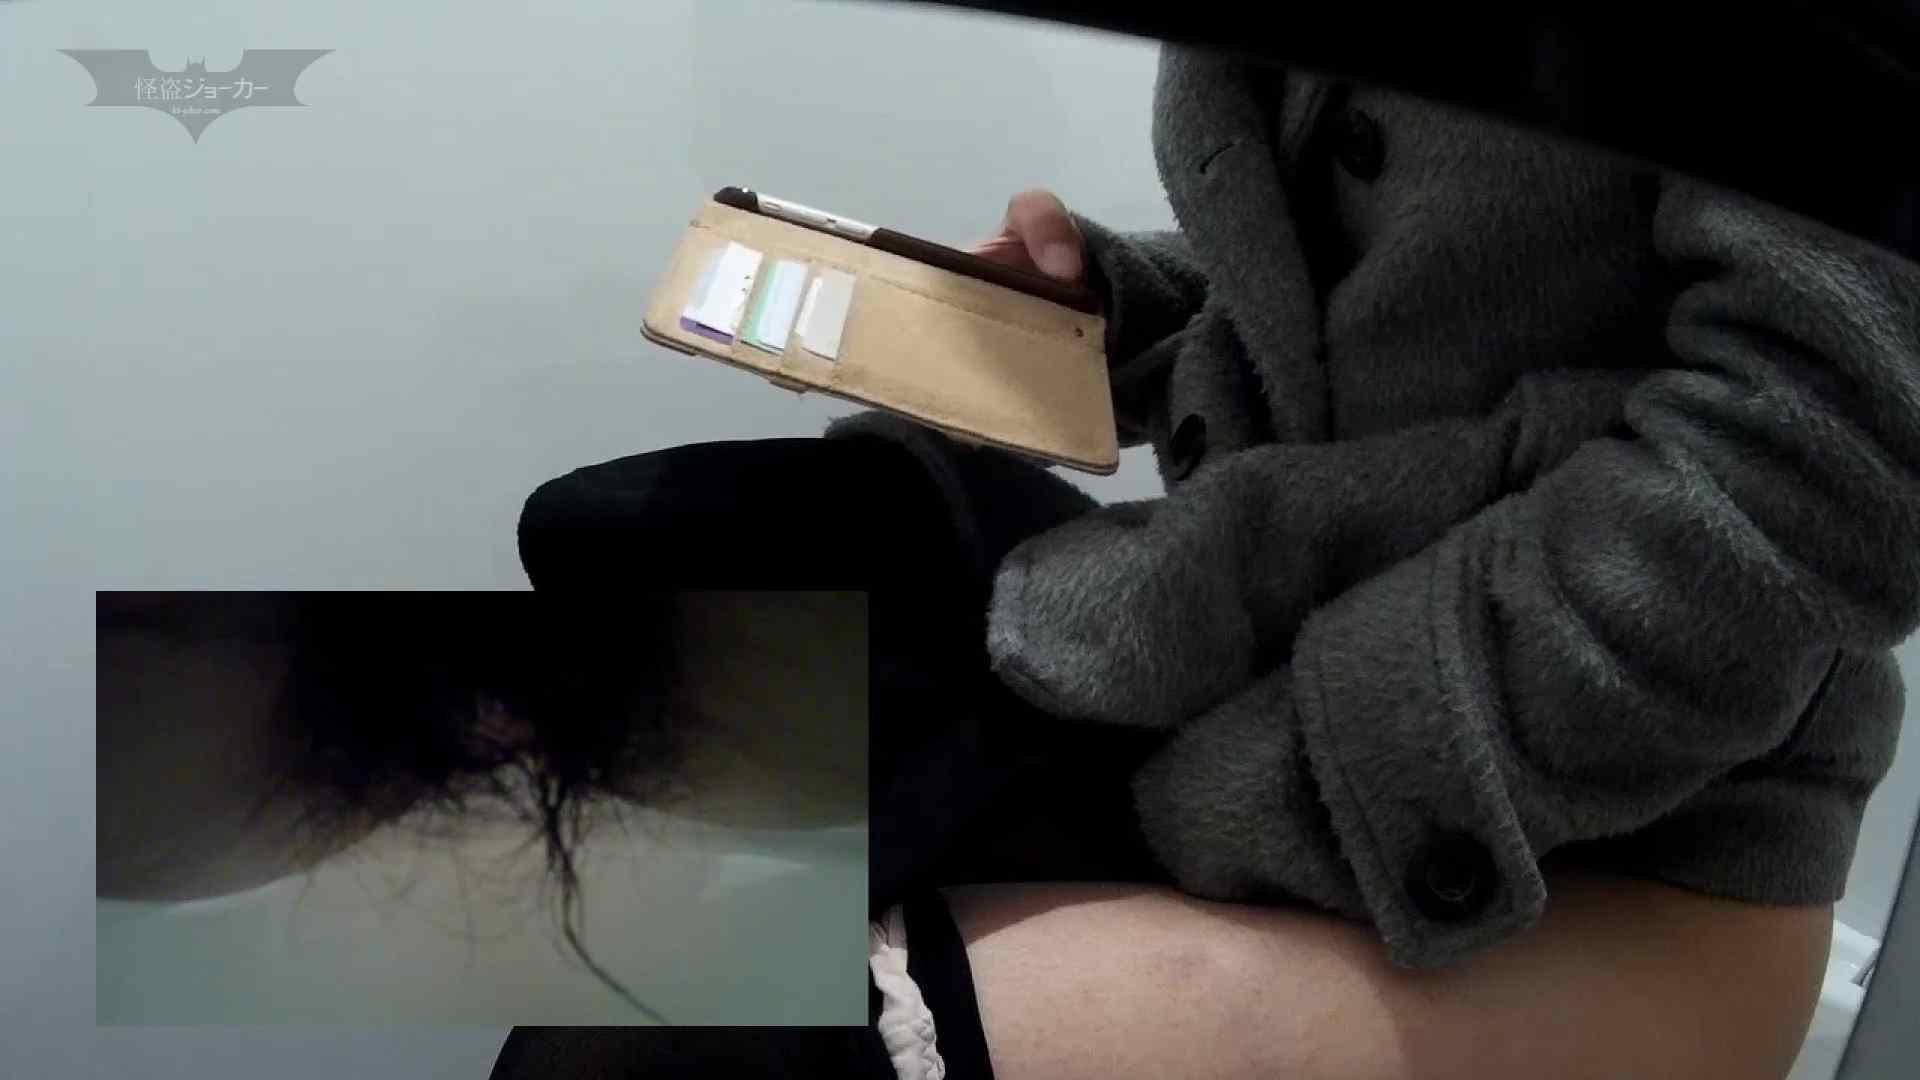 有名大学女性洗面所 vol.58 アンダーヘアーも冬支度? 高画質動画  69画像 50